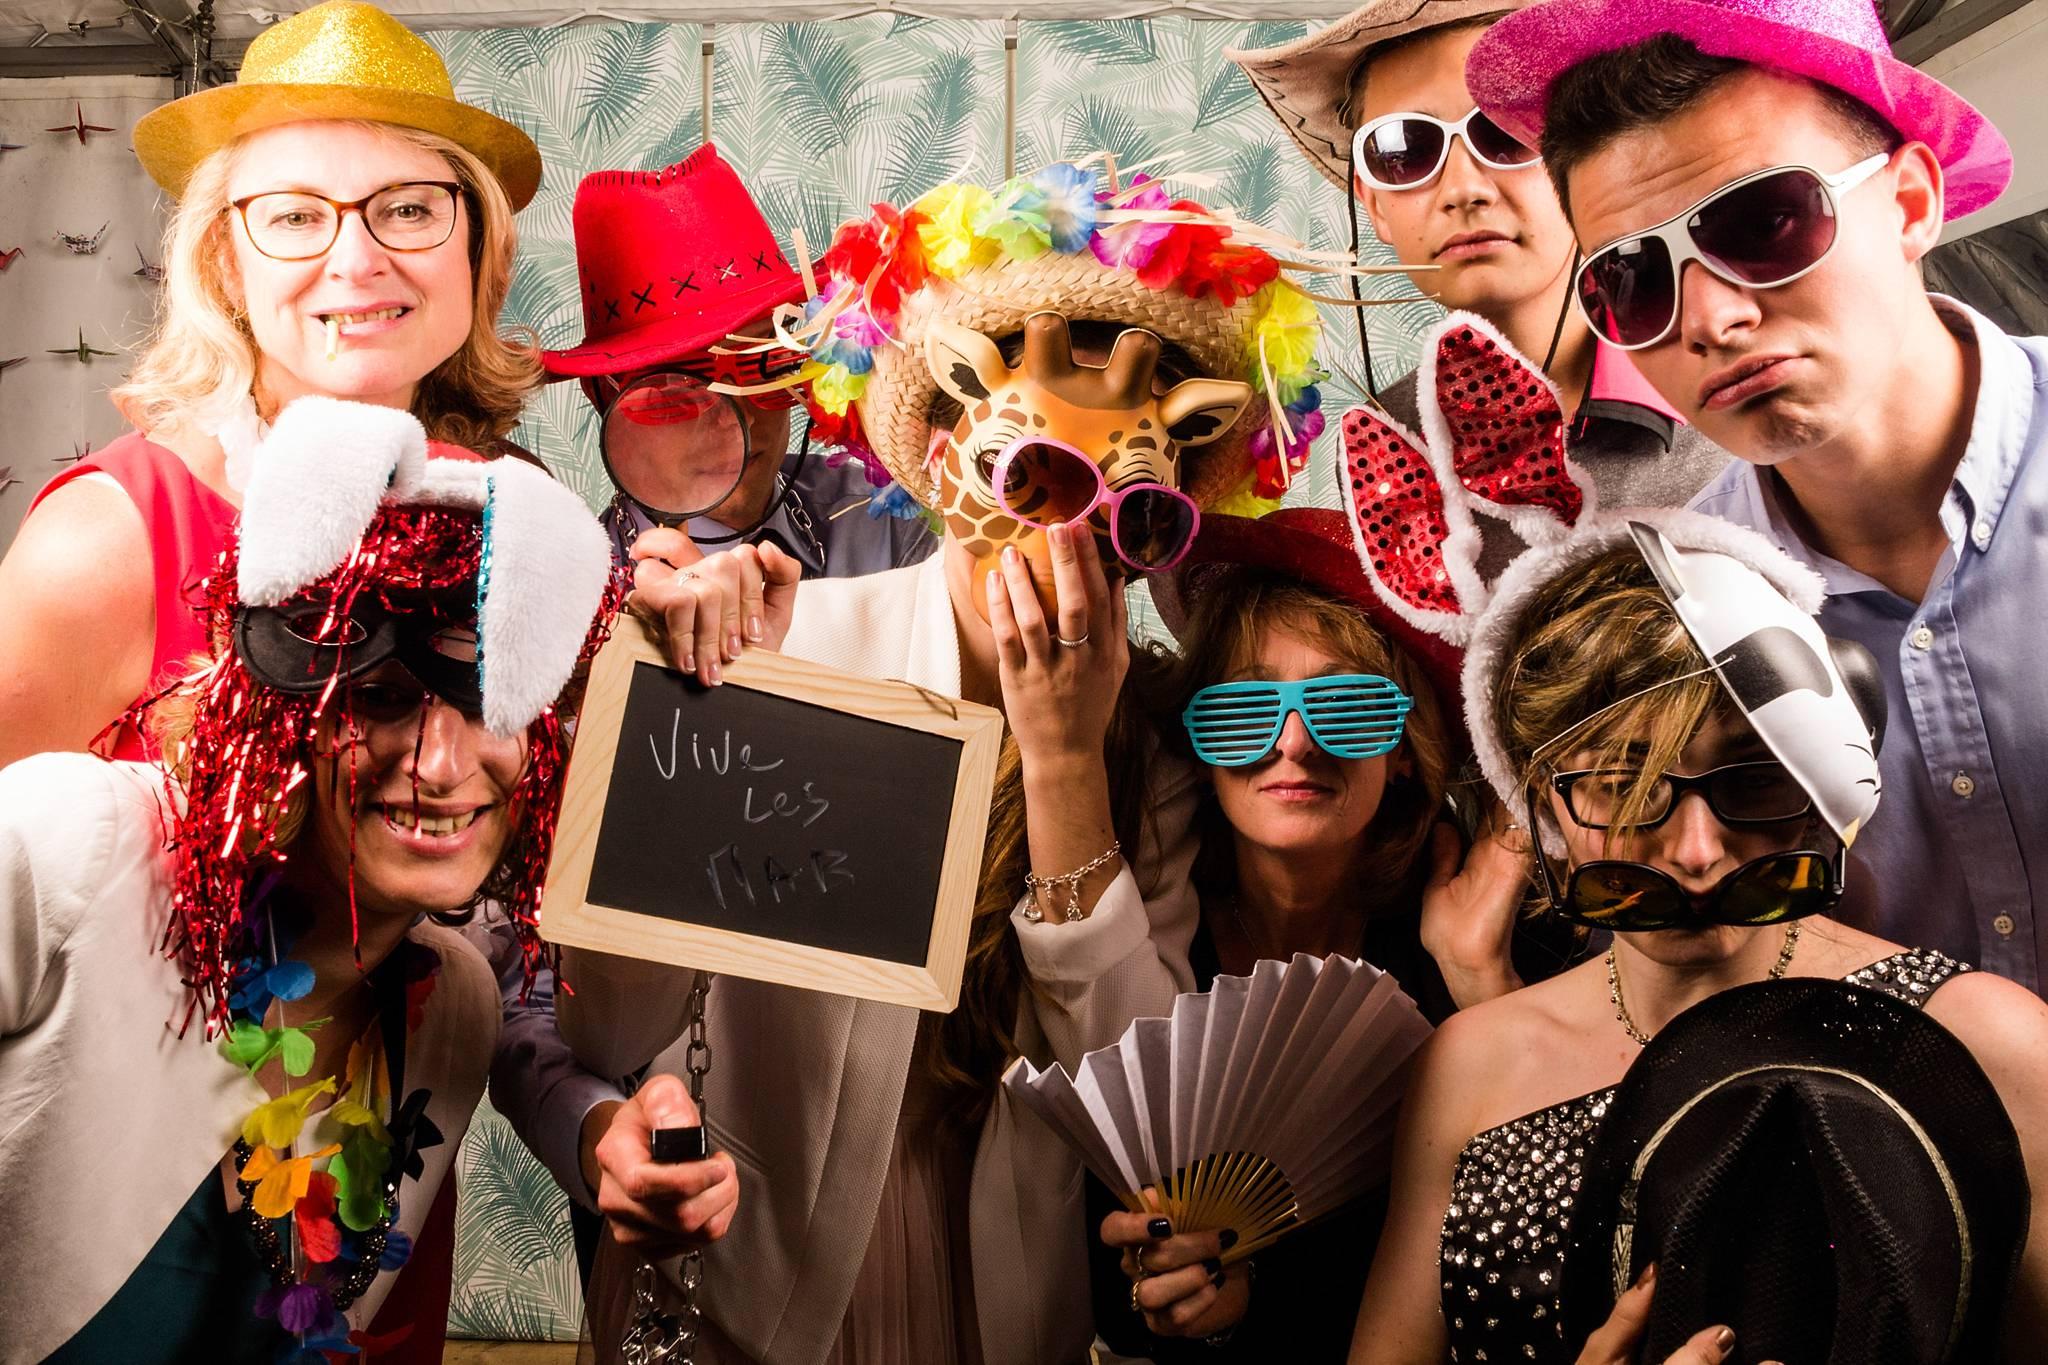 18_photobooth-mariage-bordeaux-gironde-dordogne-charentes-alexandre-roschewitz-photographies_2048px